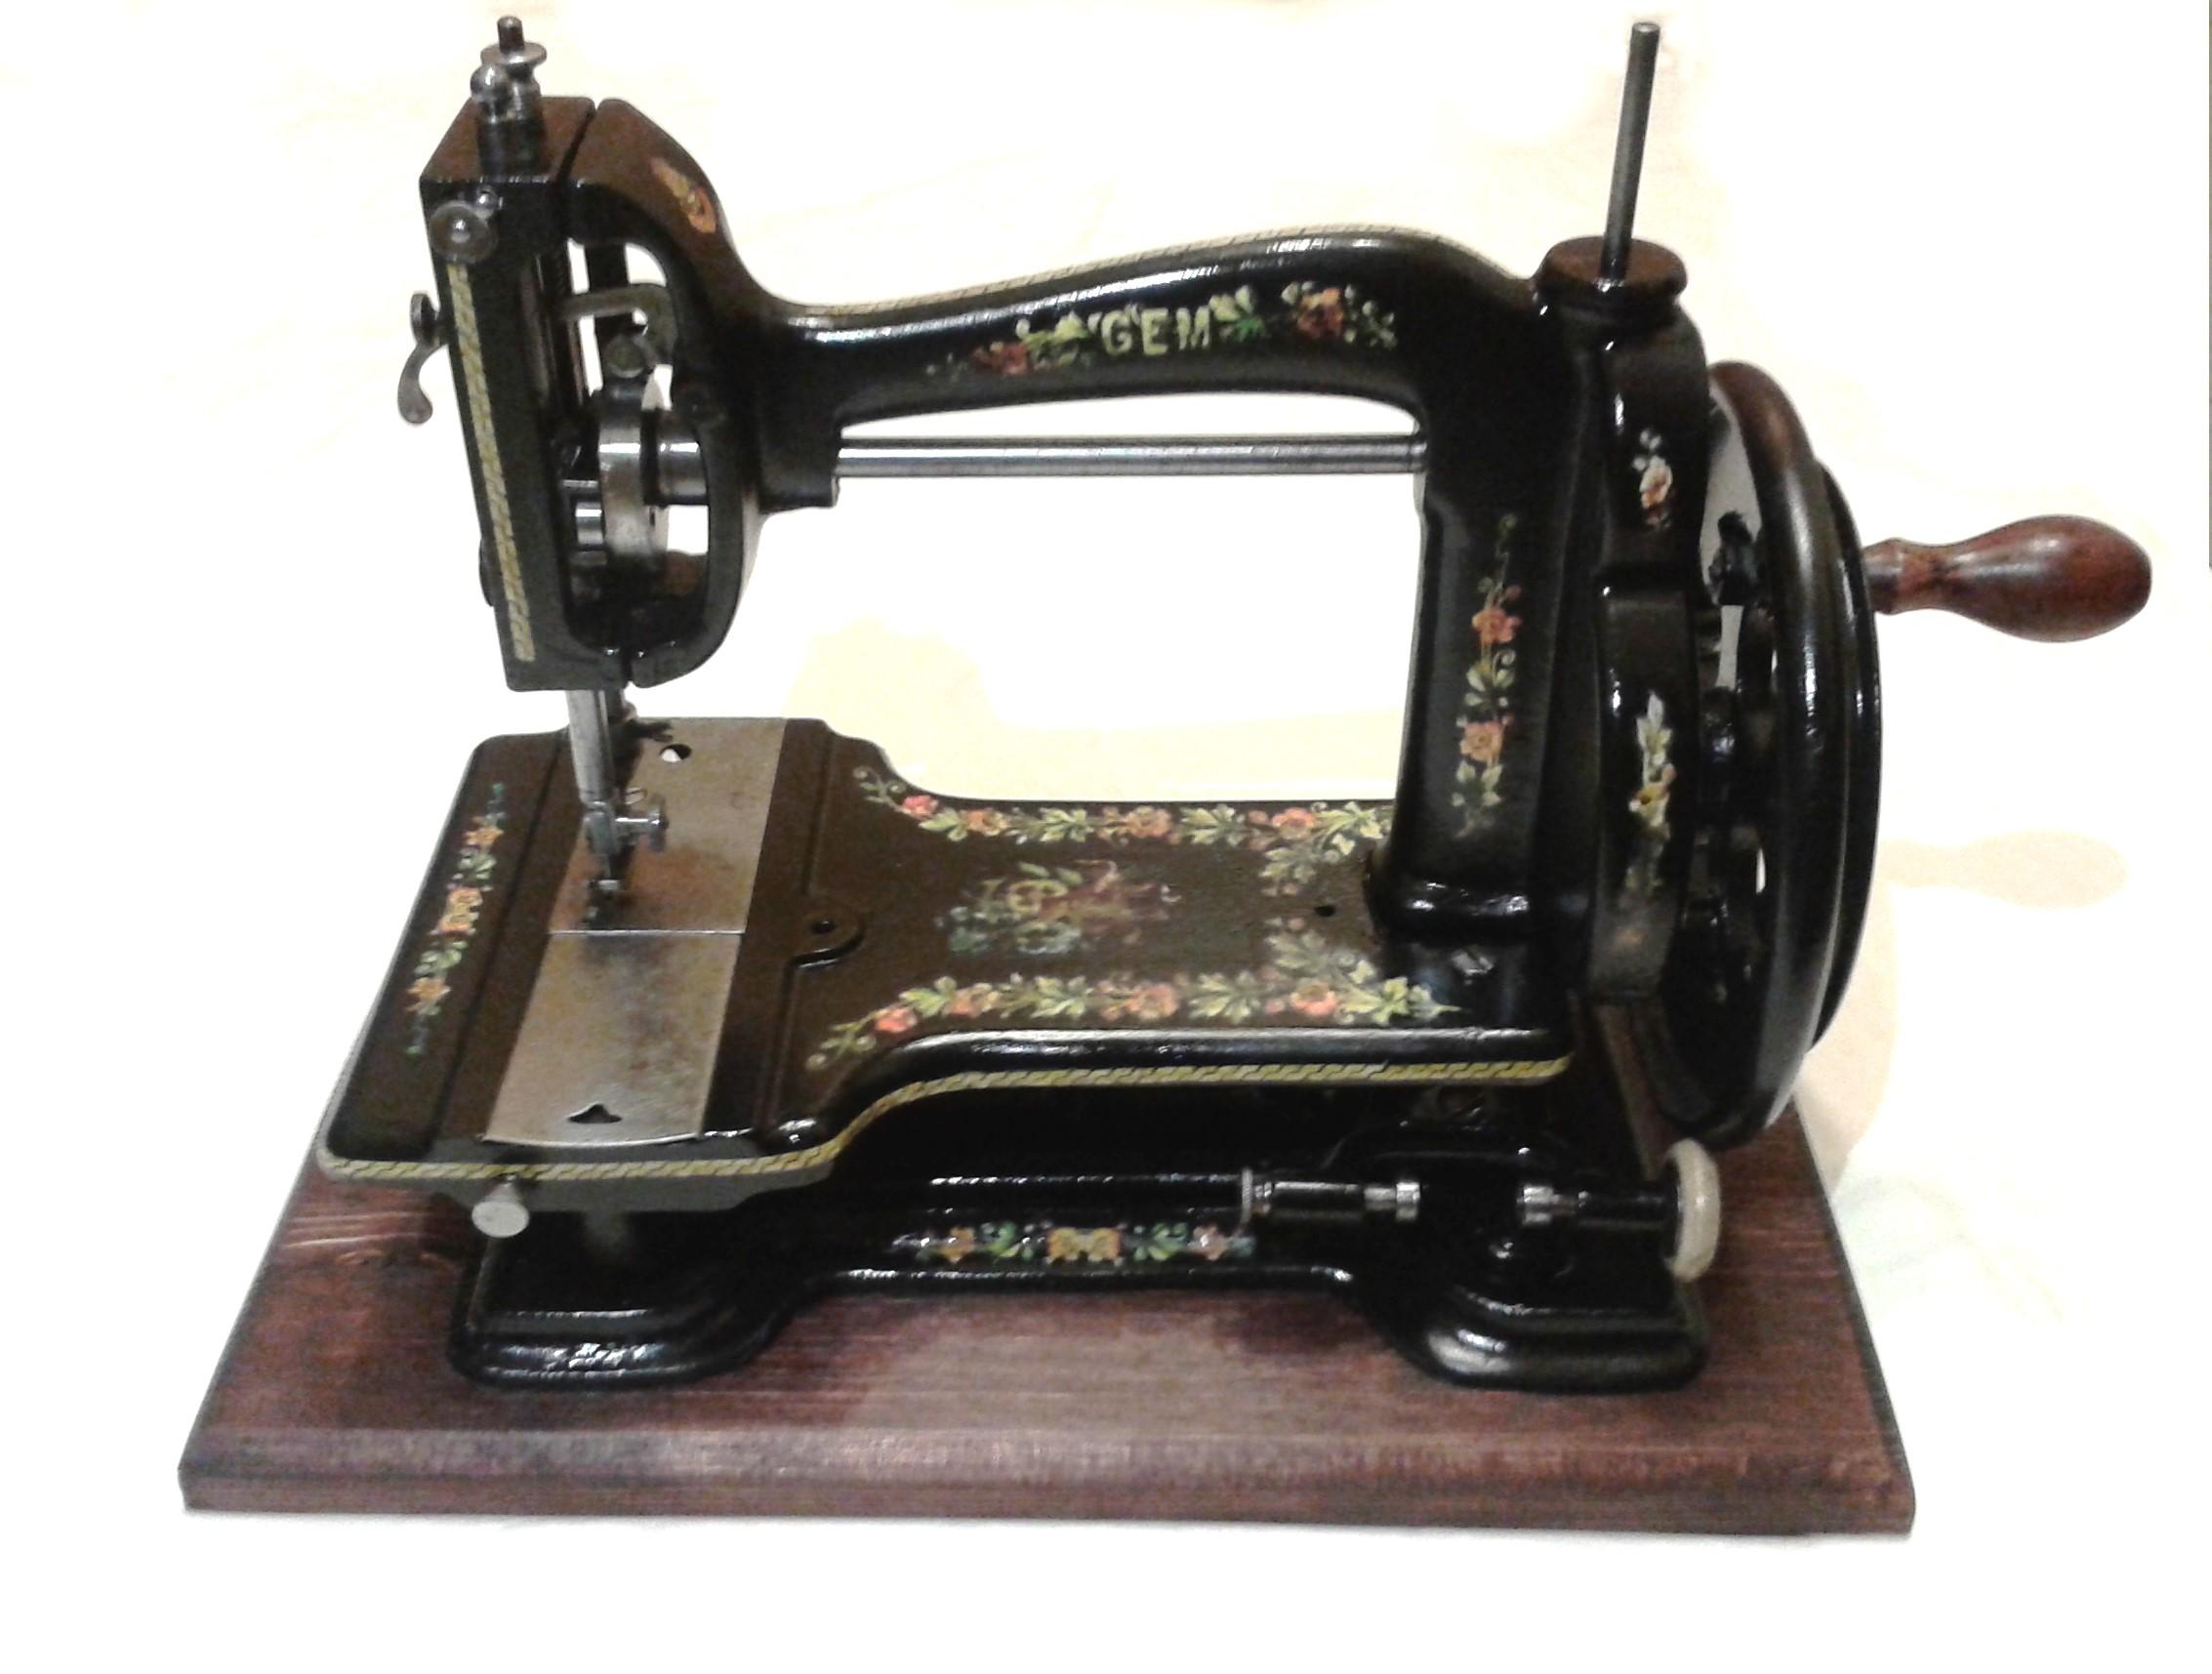 7166dd388d8 List of sewing machine brands - Wikipedia